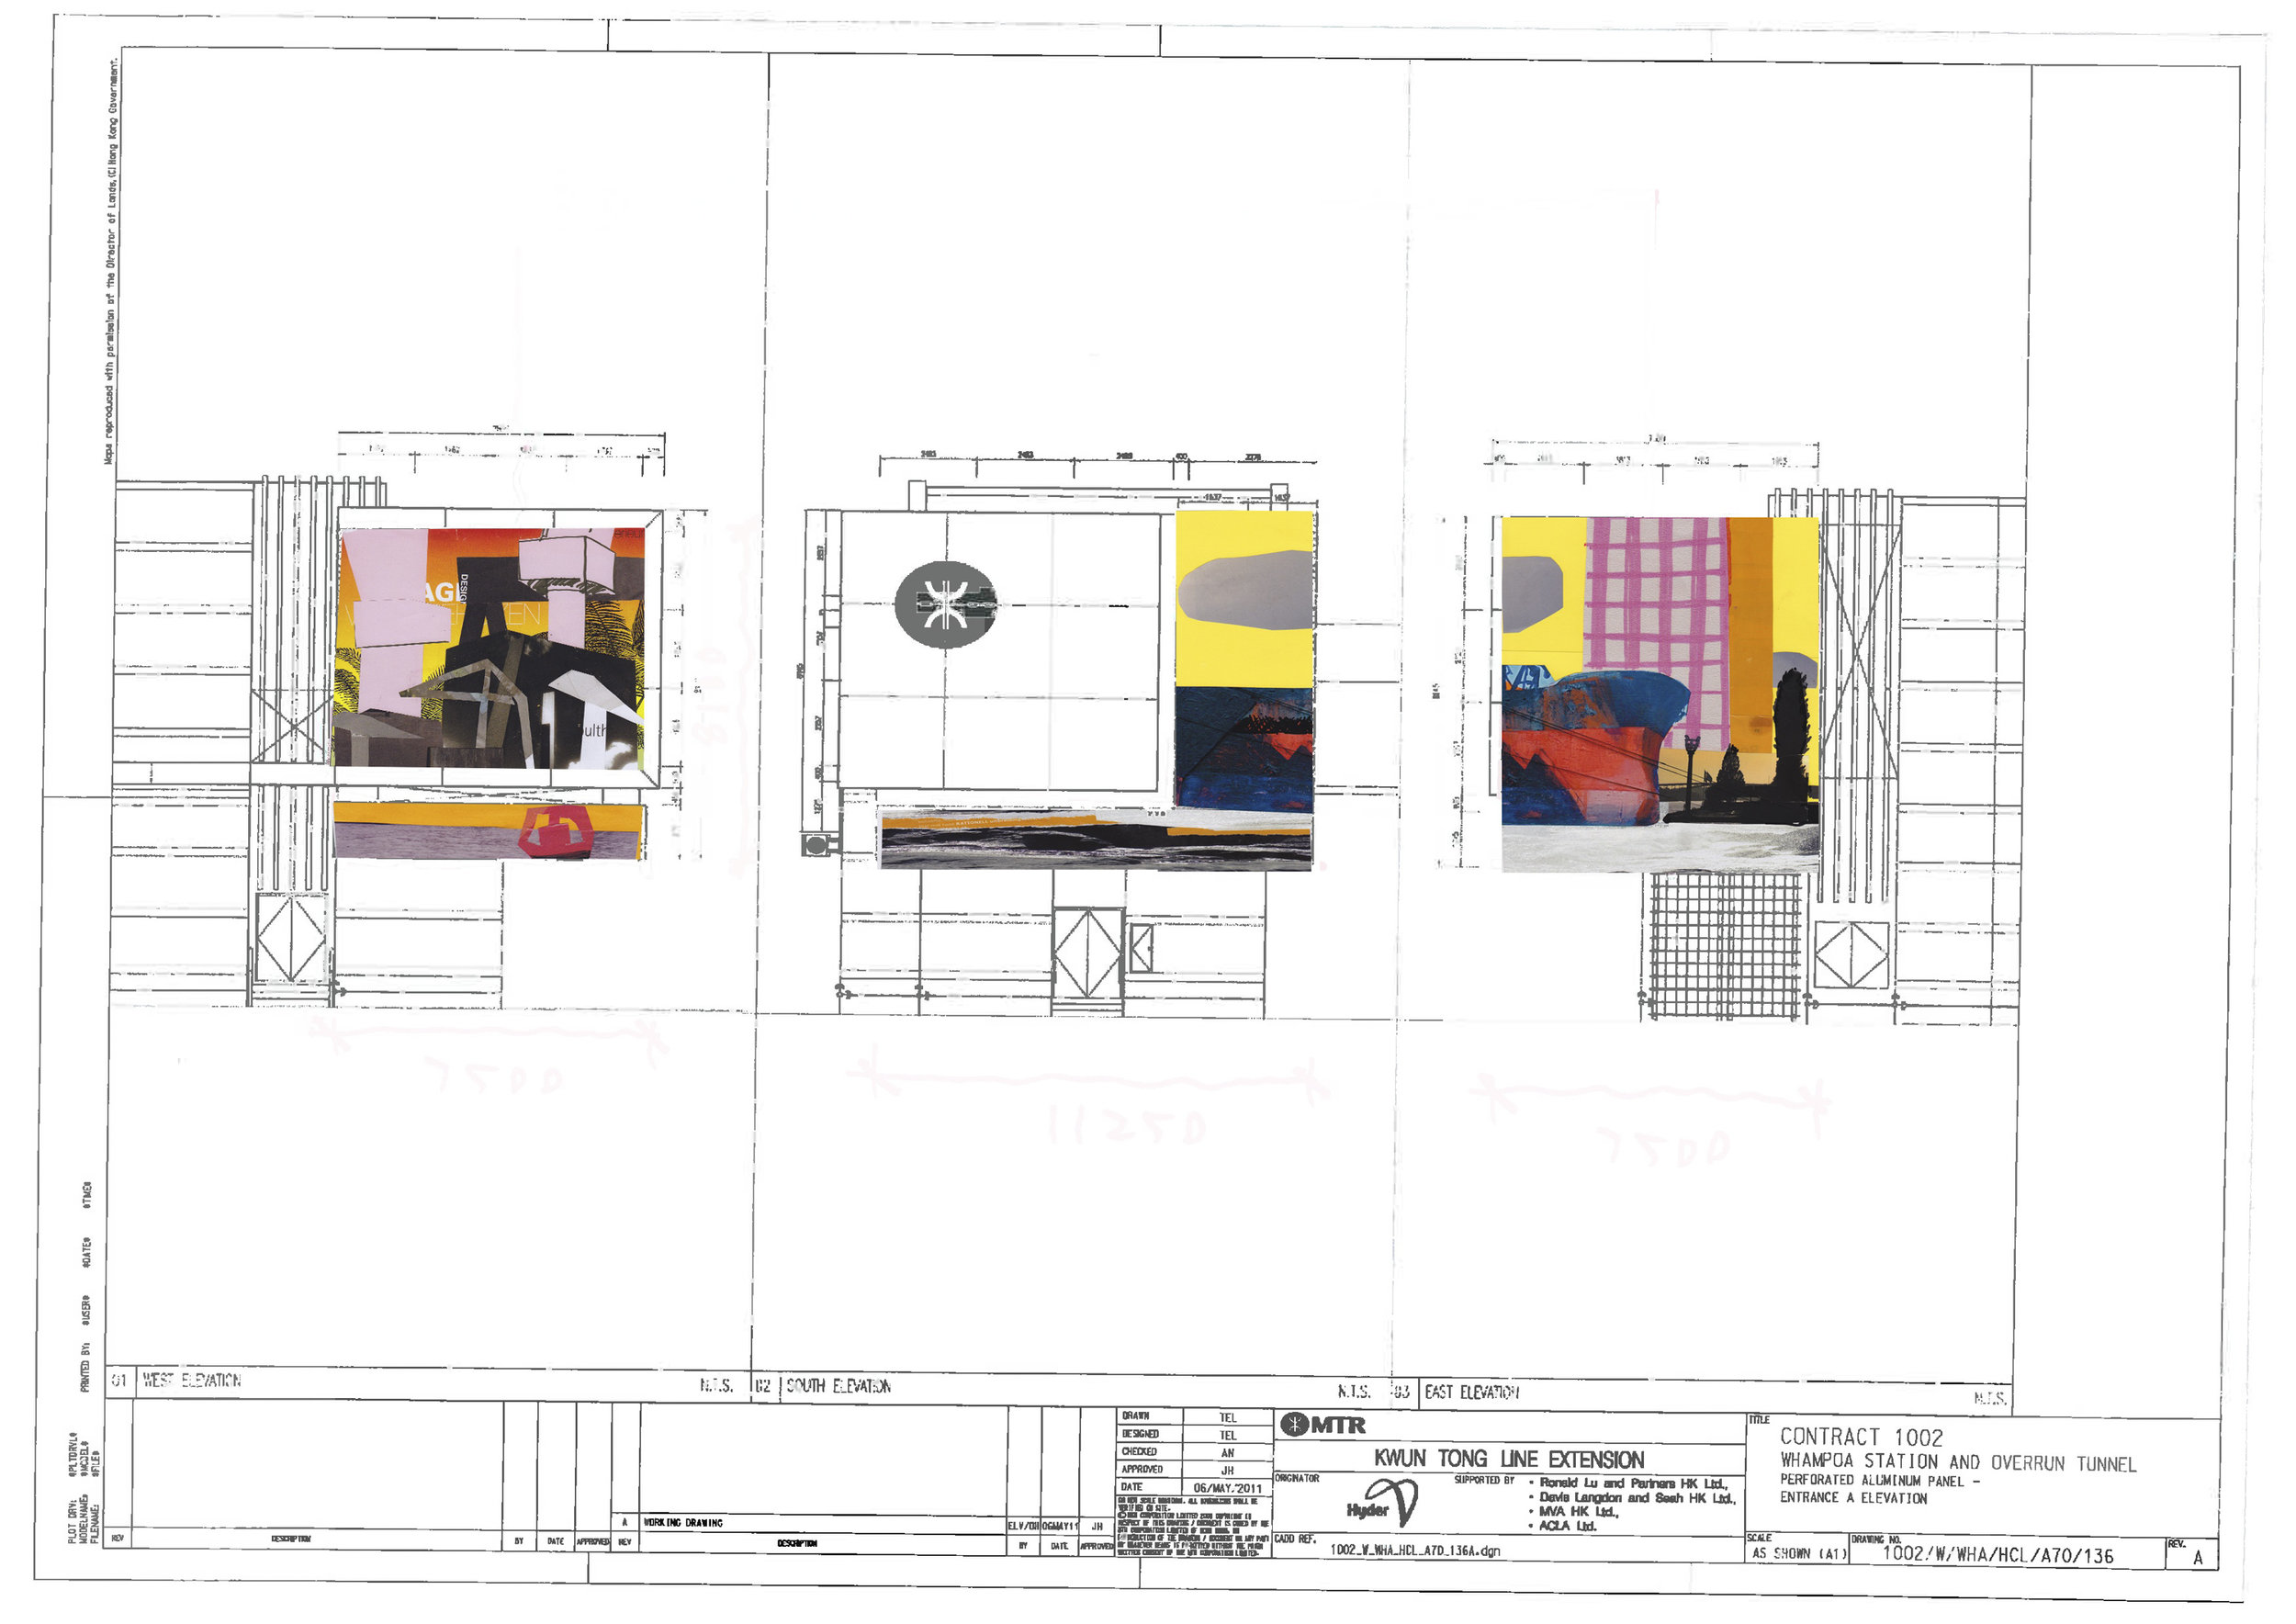 bouwtekening_02_whampoa staion.jpg